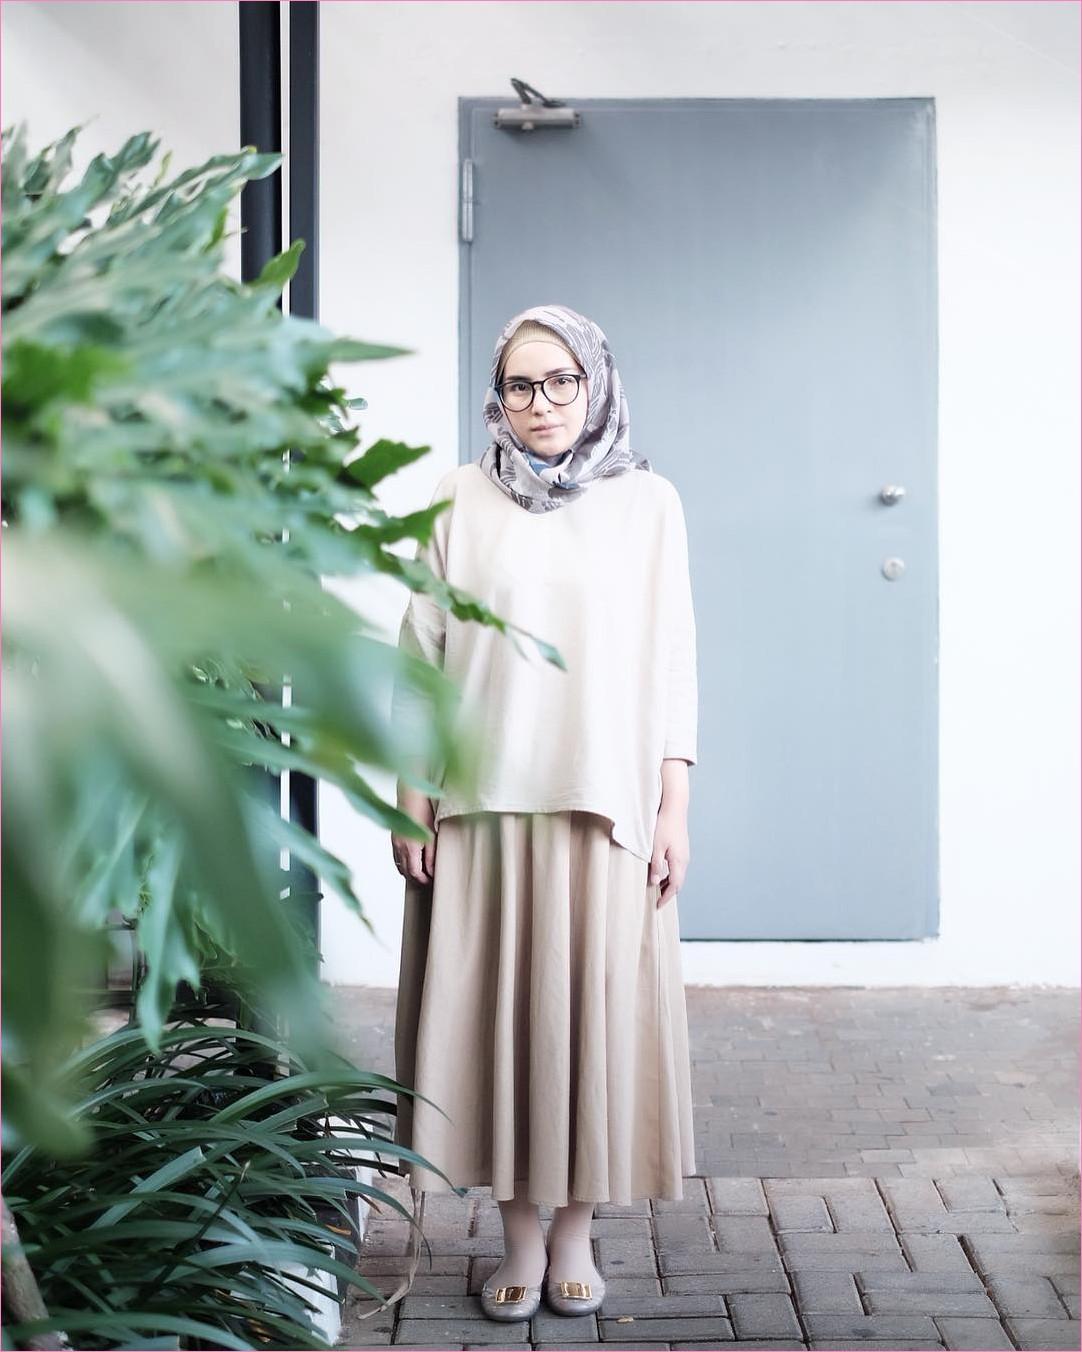 Outfit Rok Untuk Hijabers Ala Selebgram 2018 flatshoes lace ups legging kerudung segiempat hijab square abu tua top blouse krem muda broomstick skirt polkadot krem kacamata bulat hitam ootd trendy